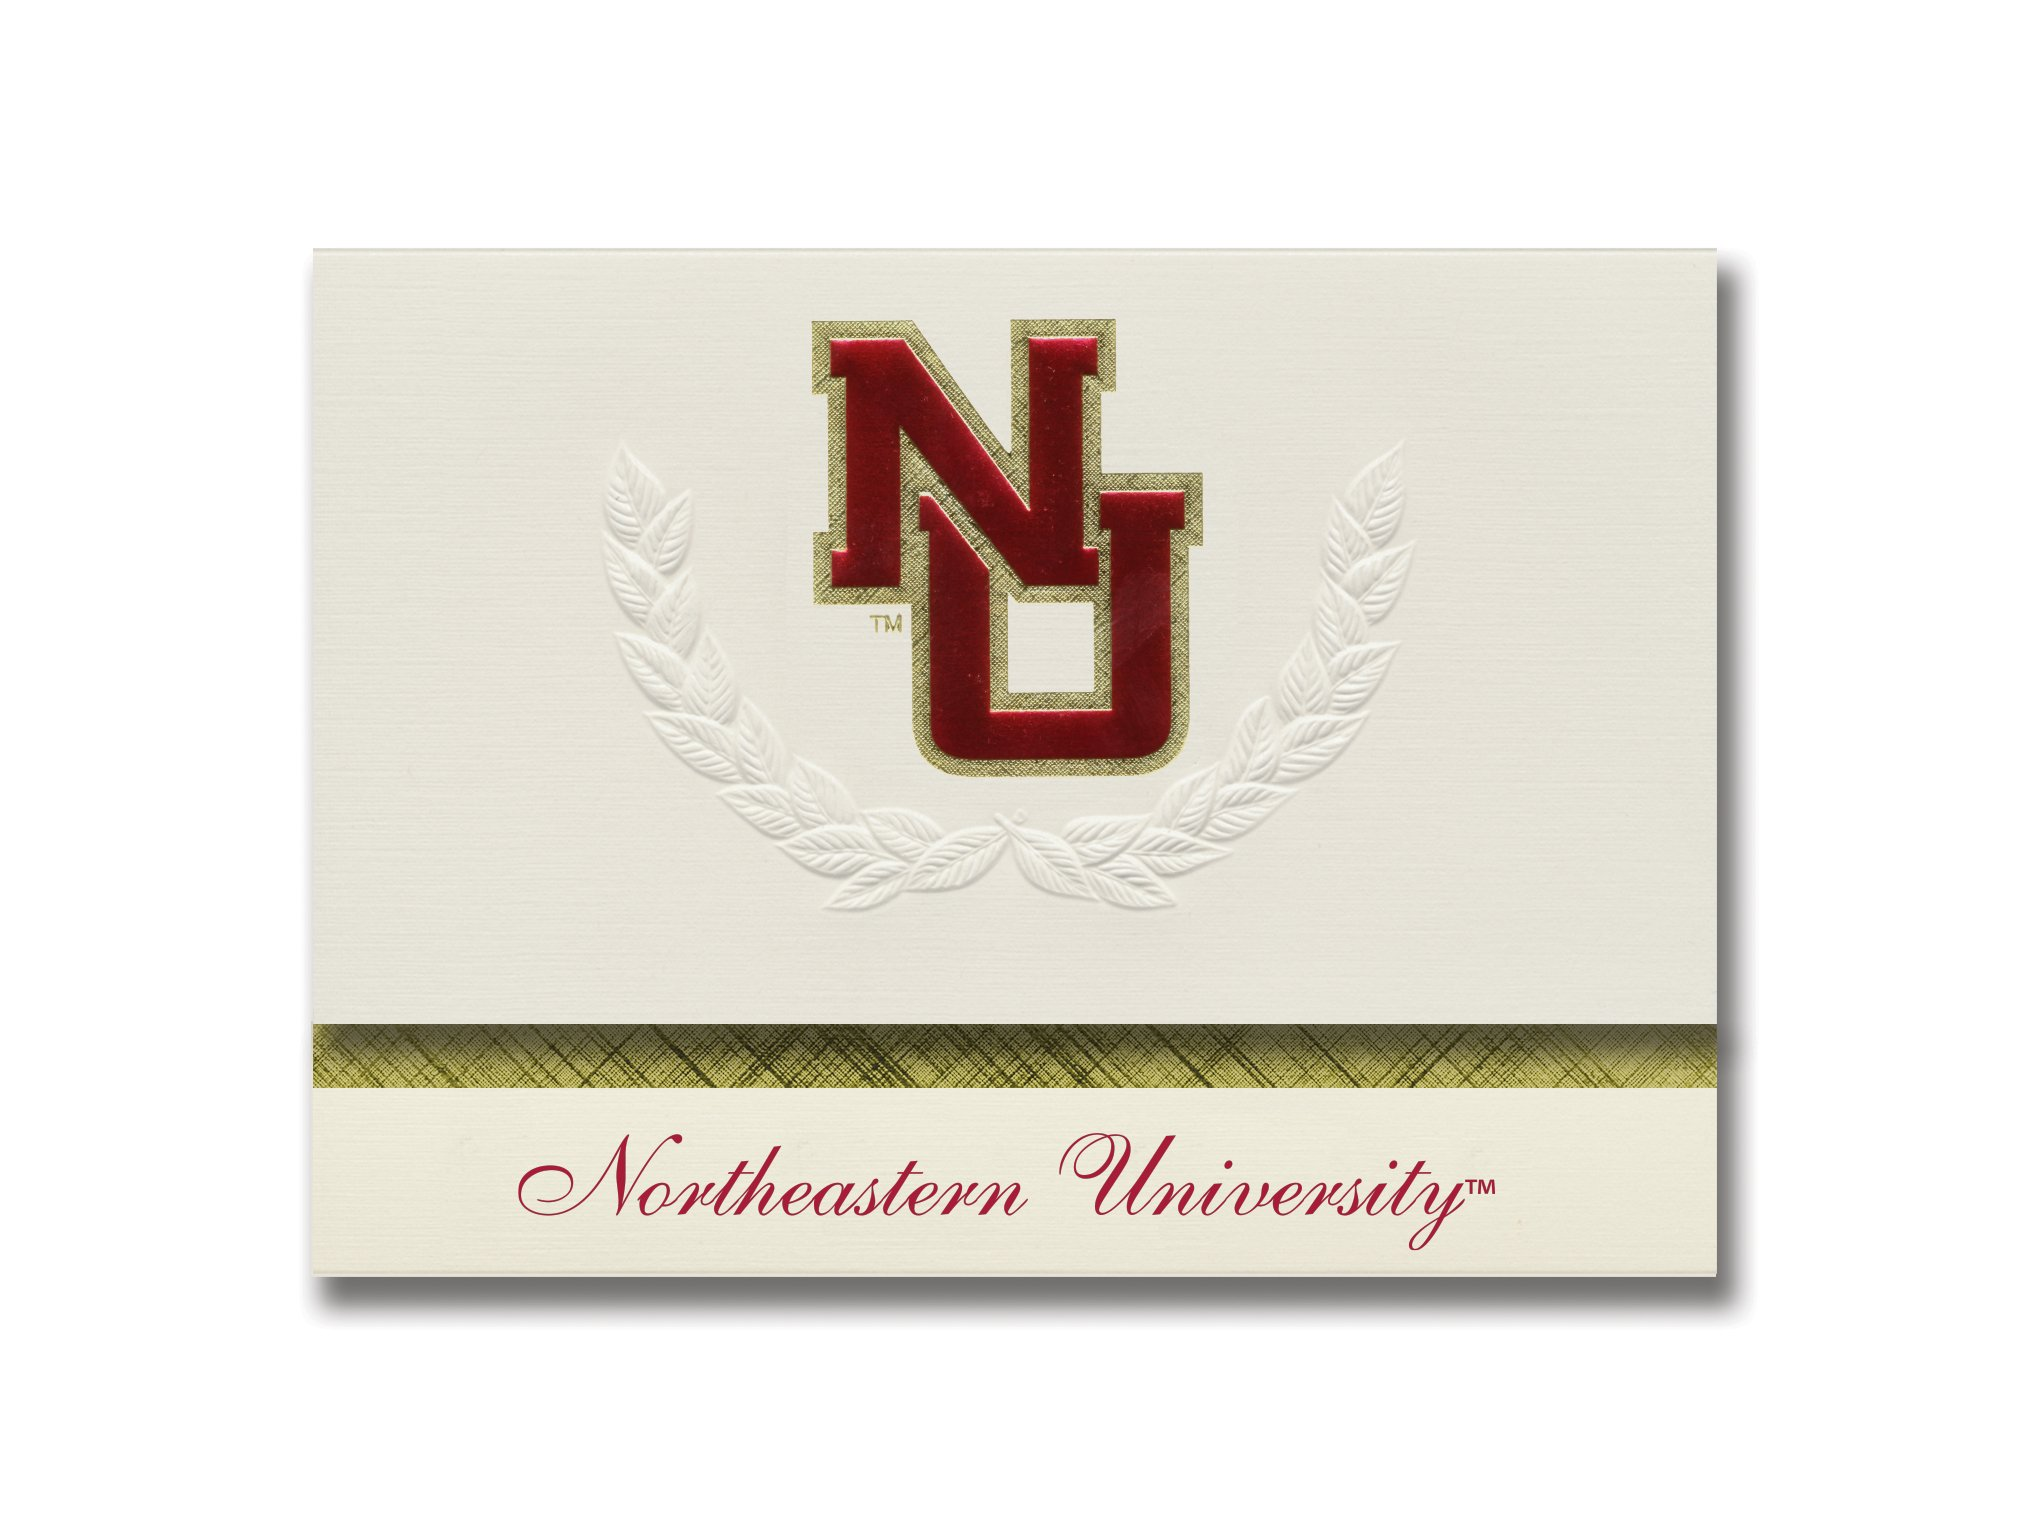 Signature Announcements Northeastern University Graduation Announcements, Platinum style, Elite Pack 20 with Northeastern U. Seal Foil